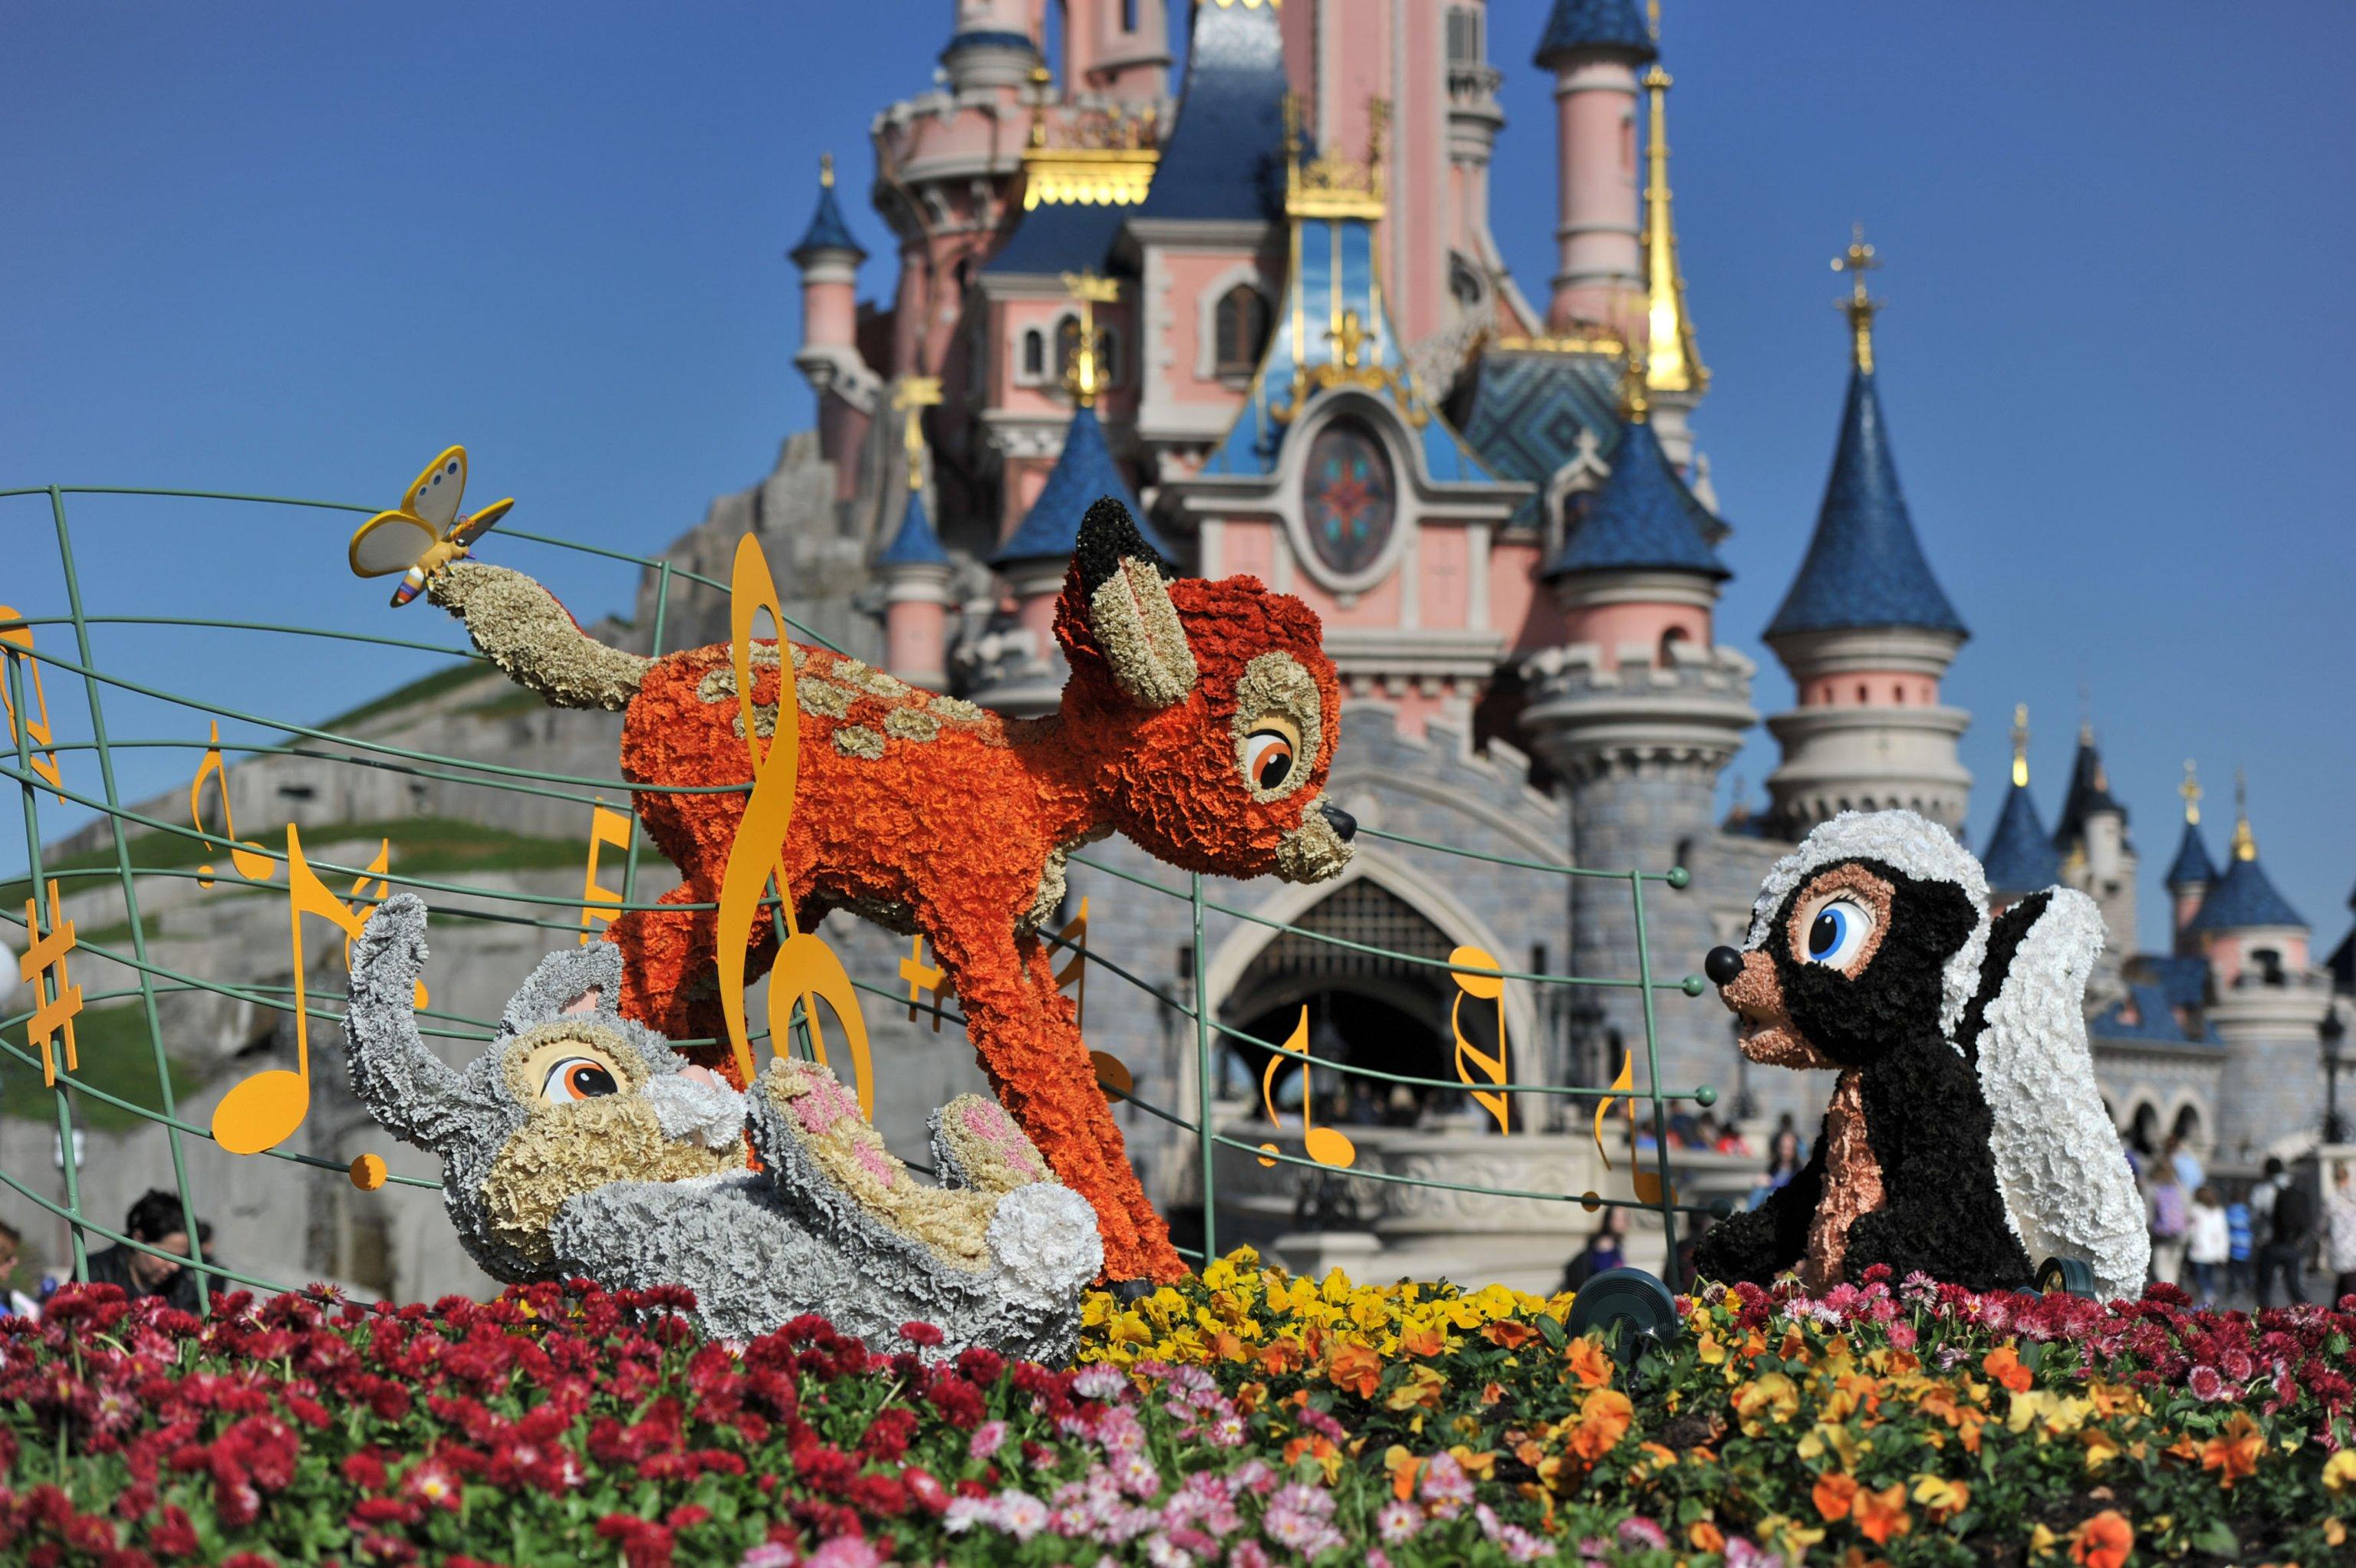 andare a Disneyland Paris - Swing into Spring